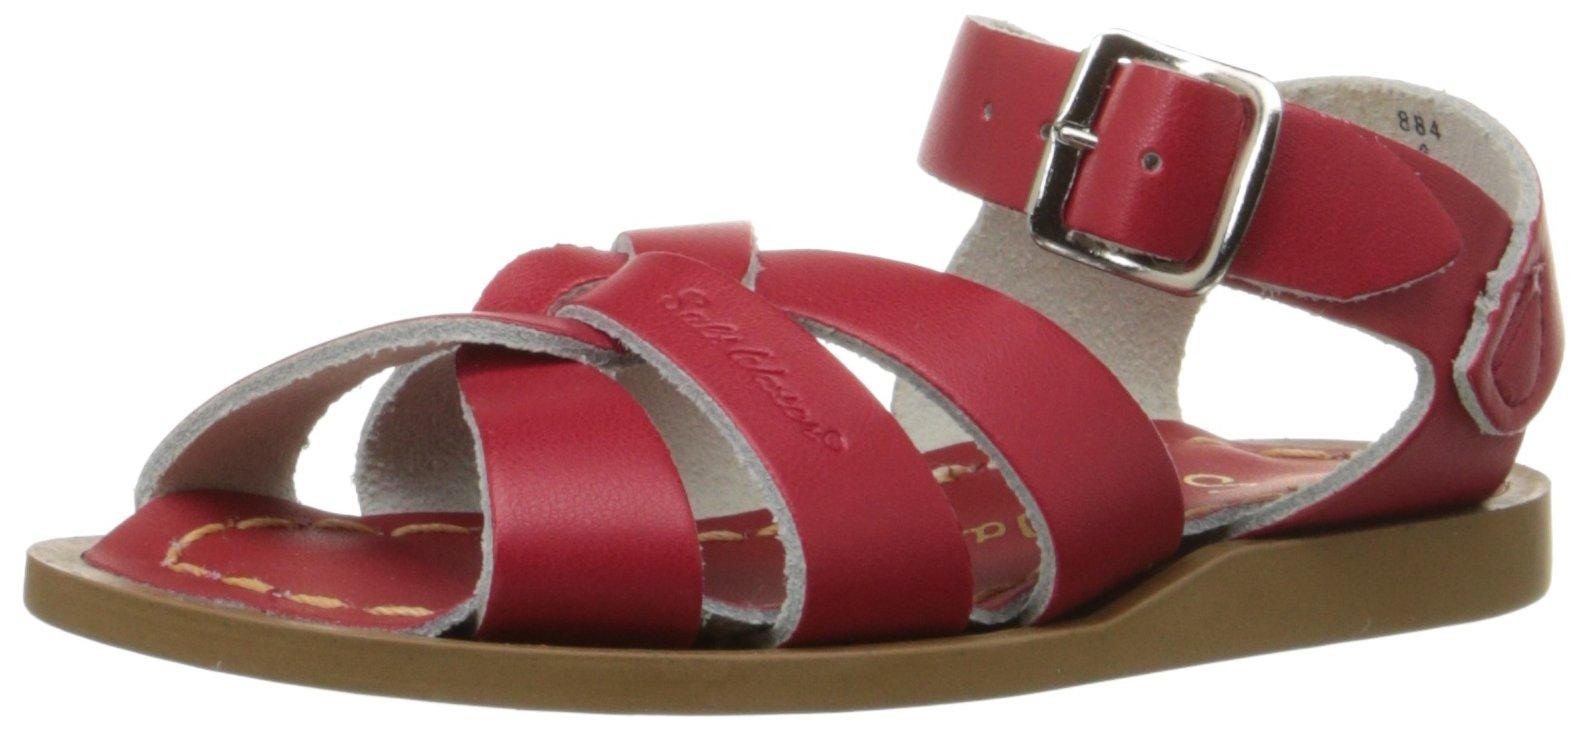 Salt Water Sandals by Hoy Shoe Original Sandal (Toddler/Little Kid/Big Kid/Women's), Red, 7 M US Big Kid